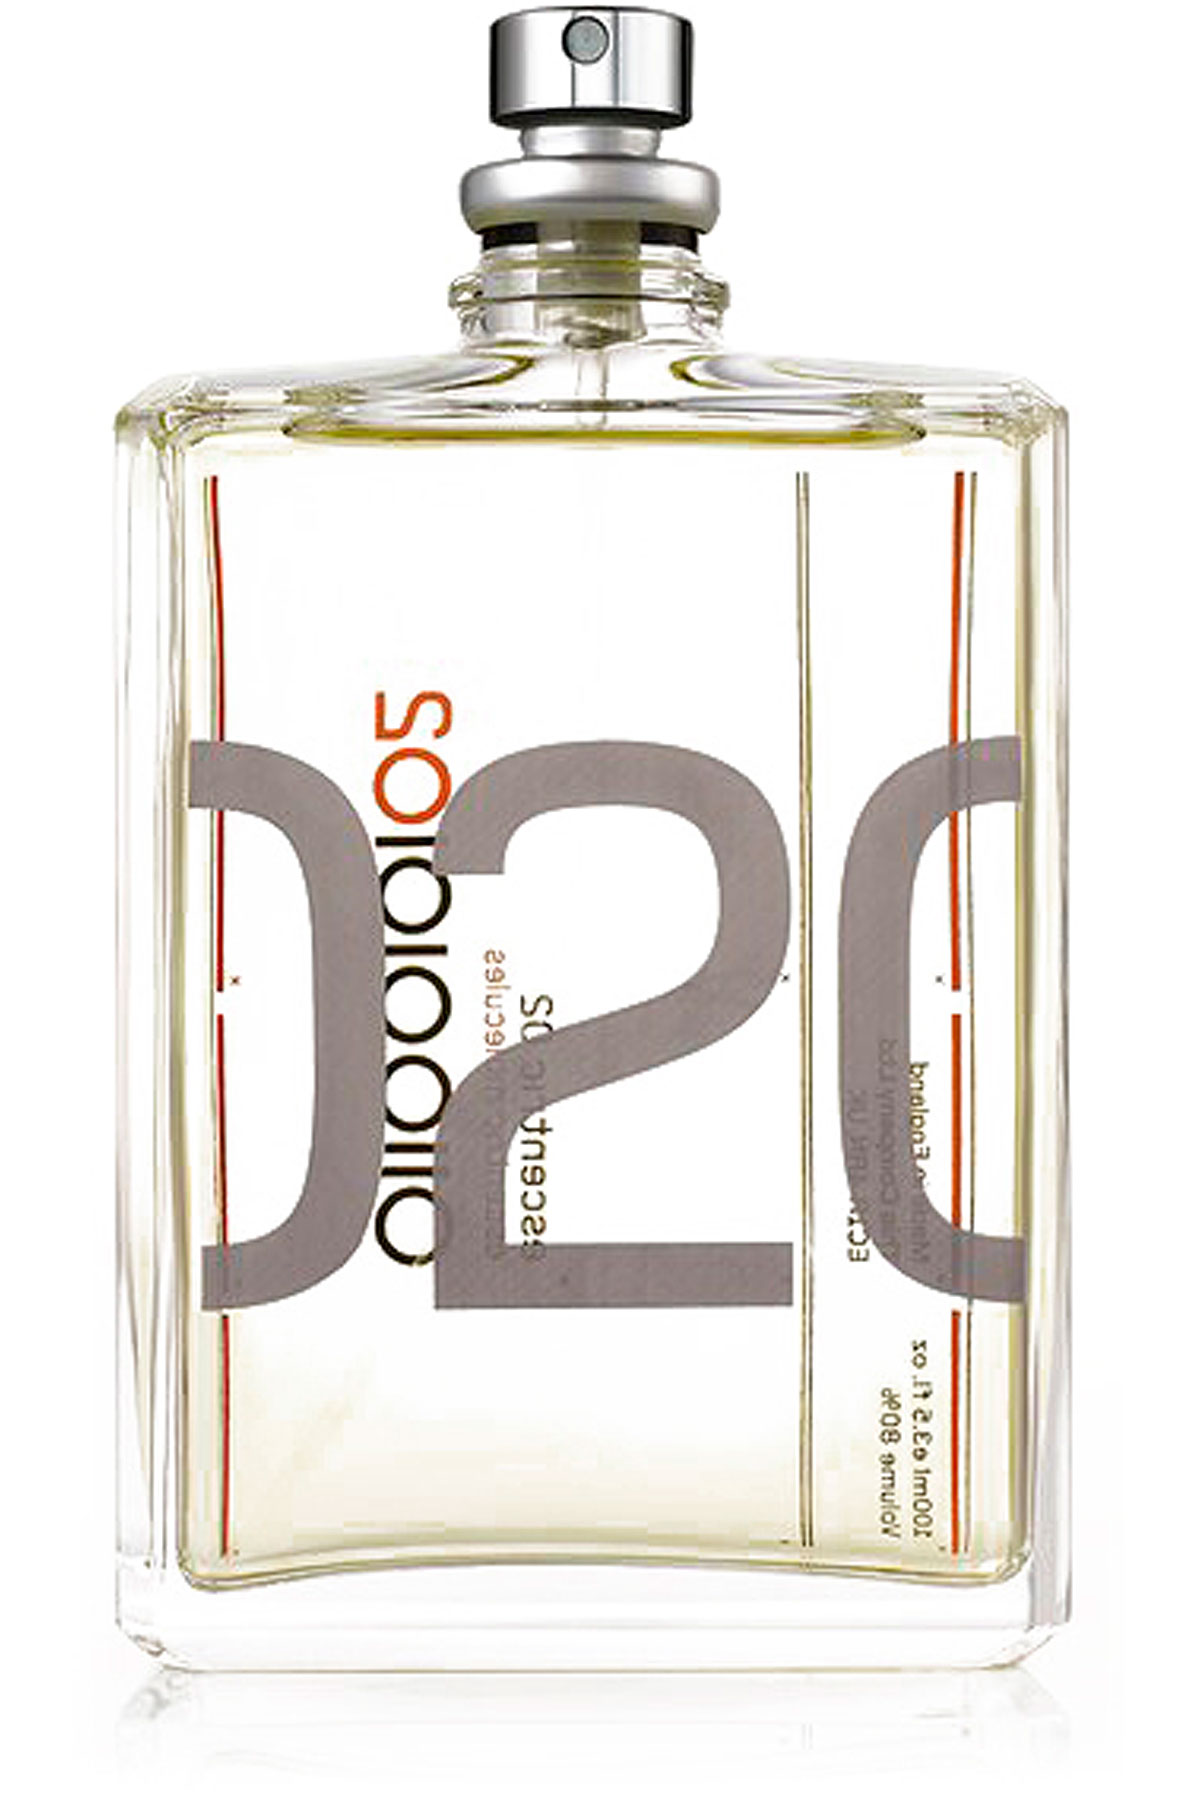 Escentric Molecules Fragrances for Men, Escentric 02 - Eau De Parfum - 100 Ml, 2019, 100 ml